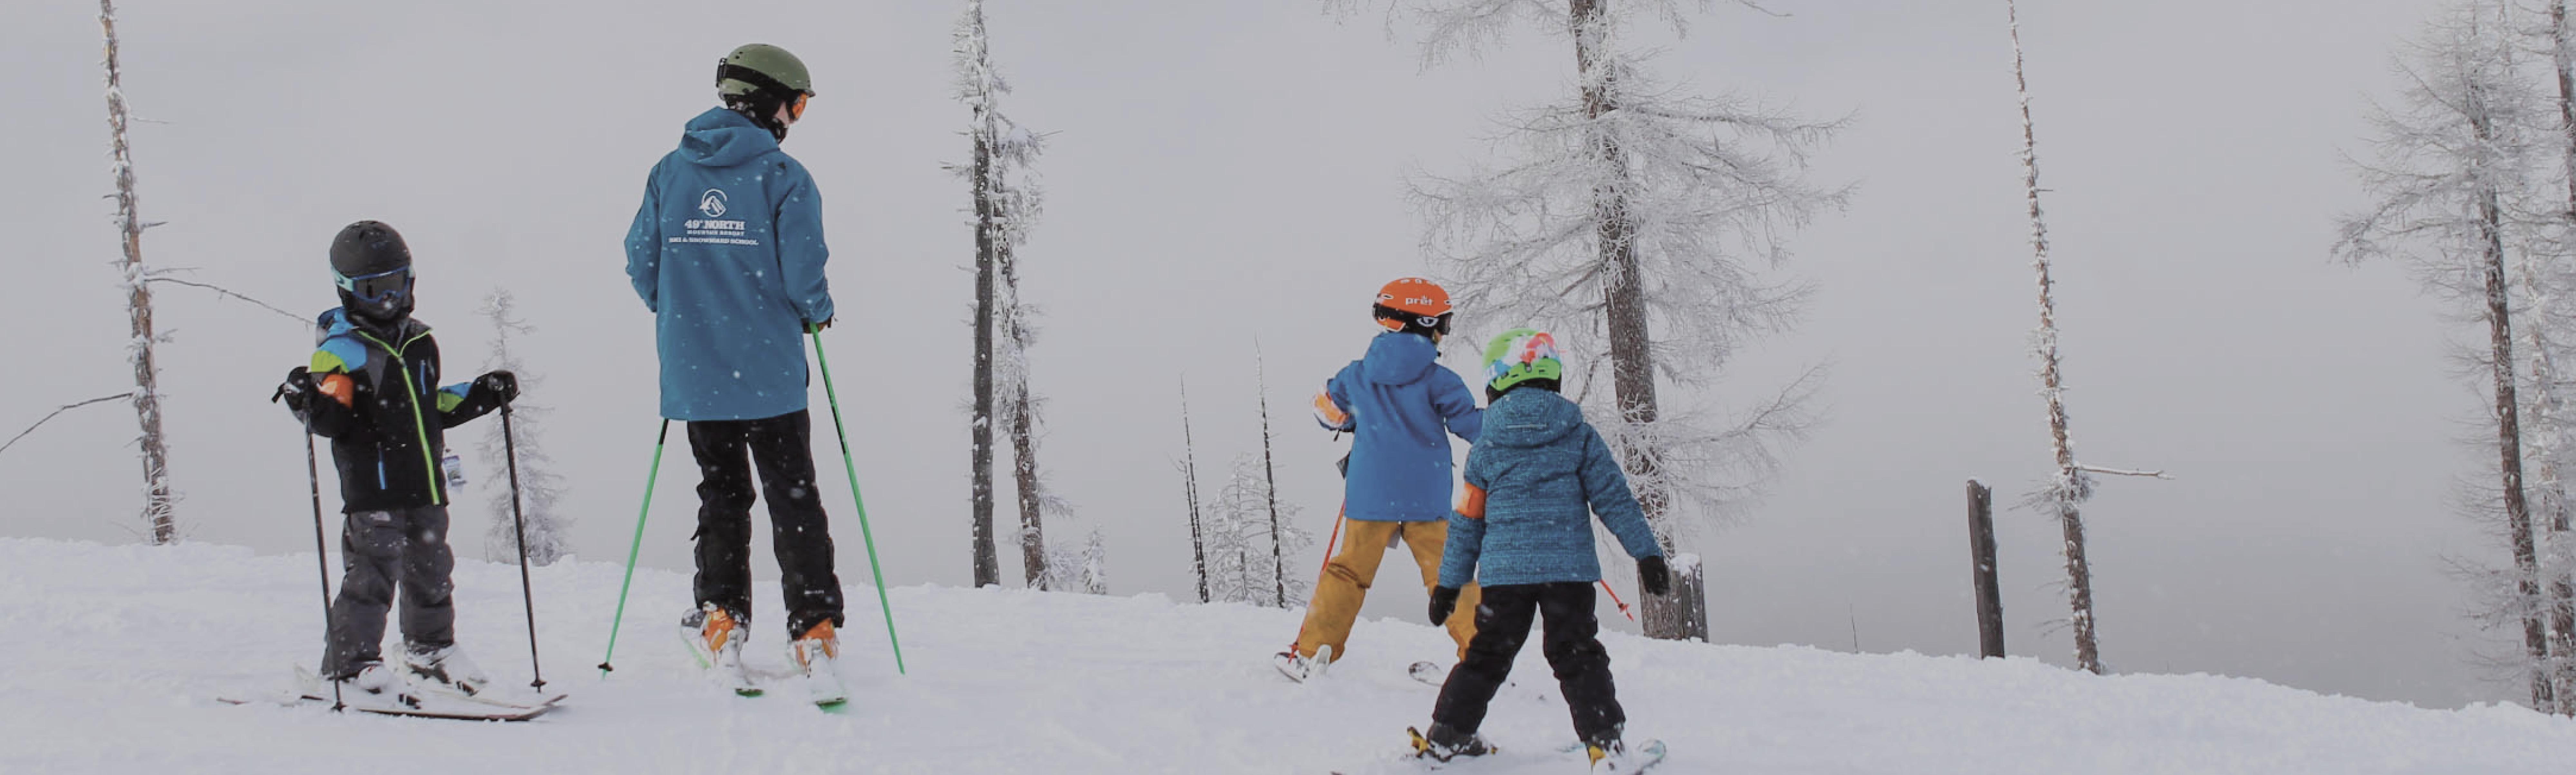 Snowsports School desktop image